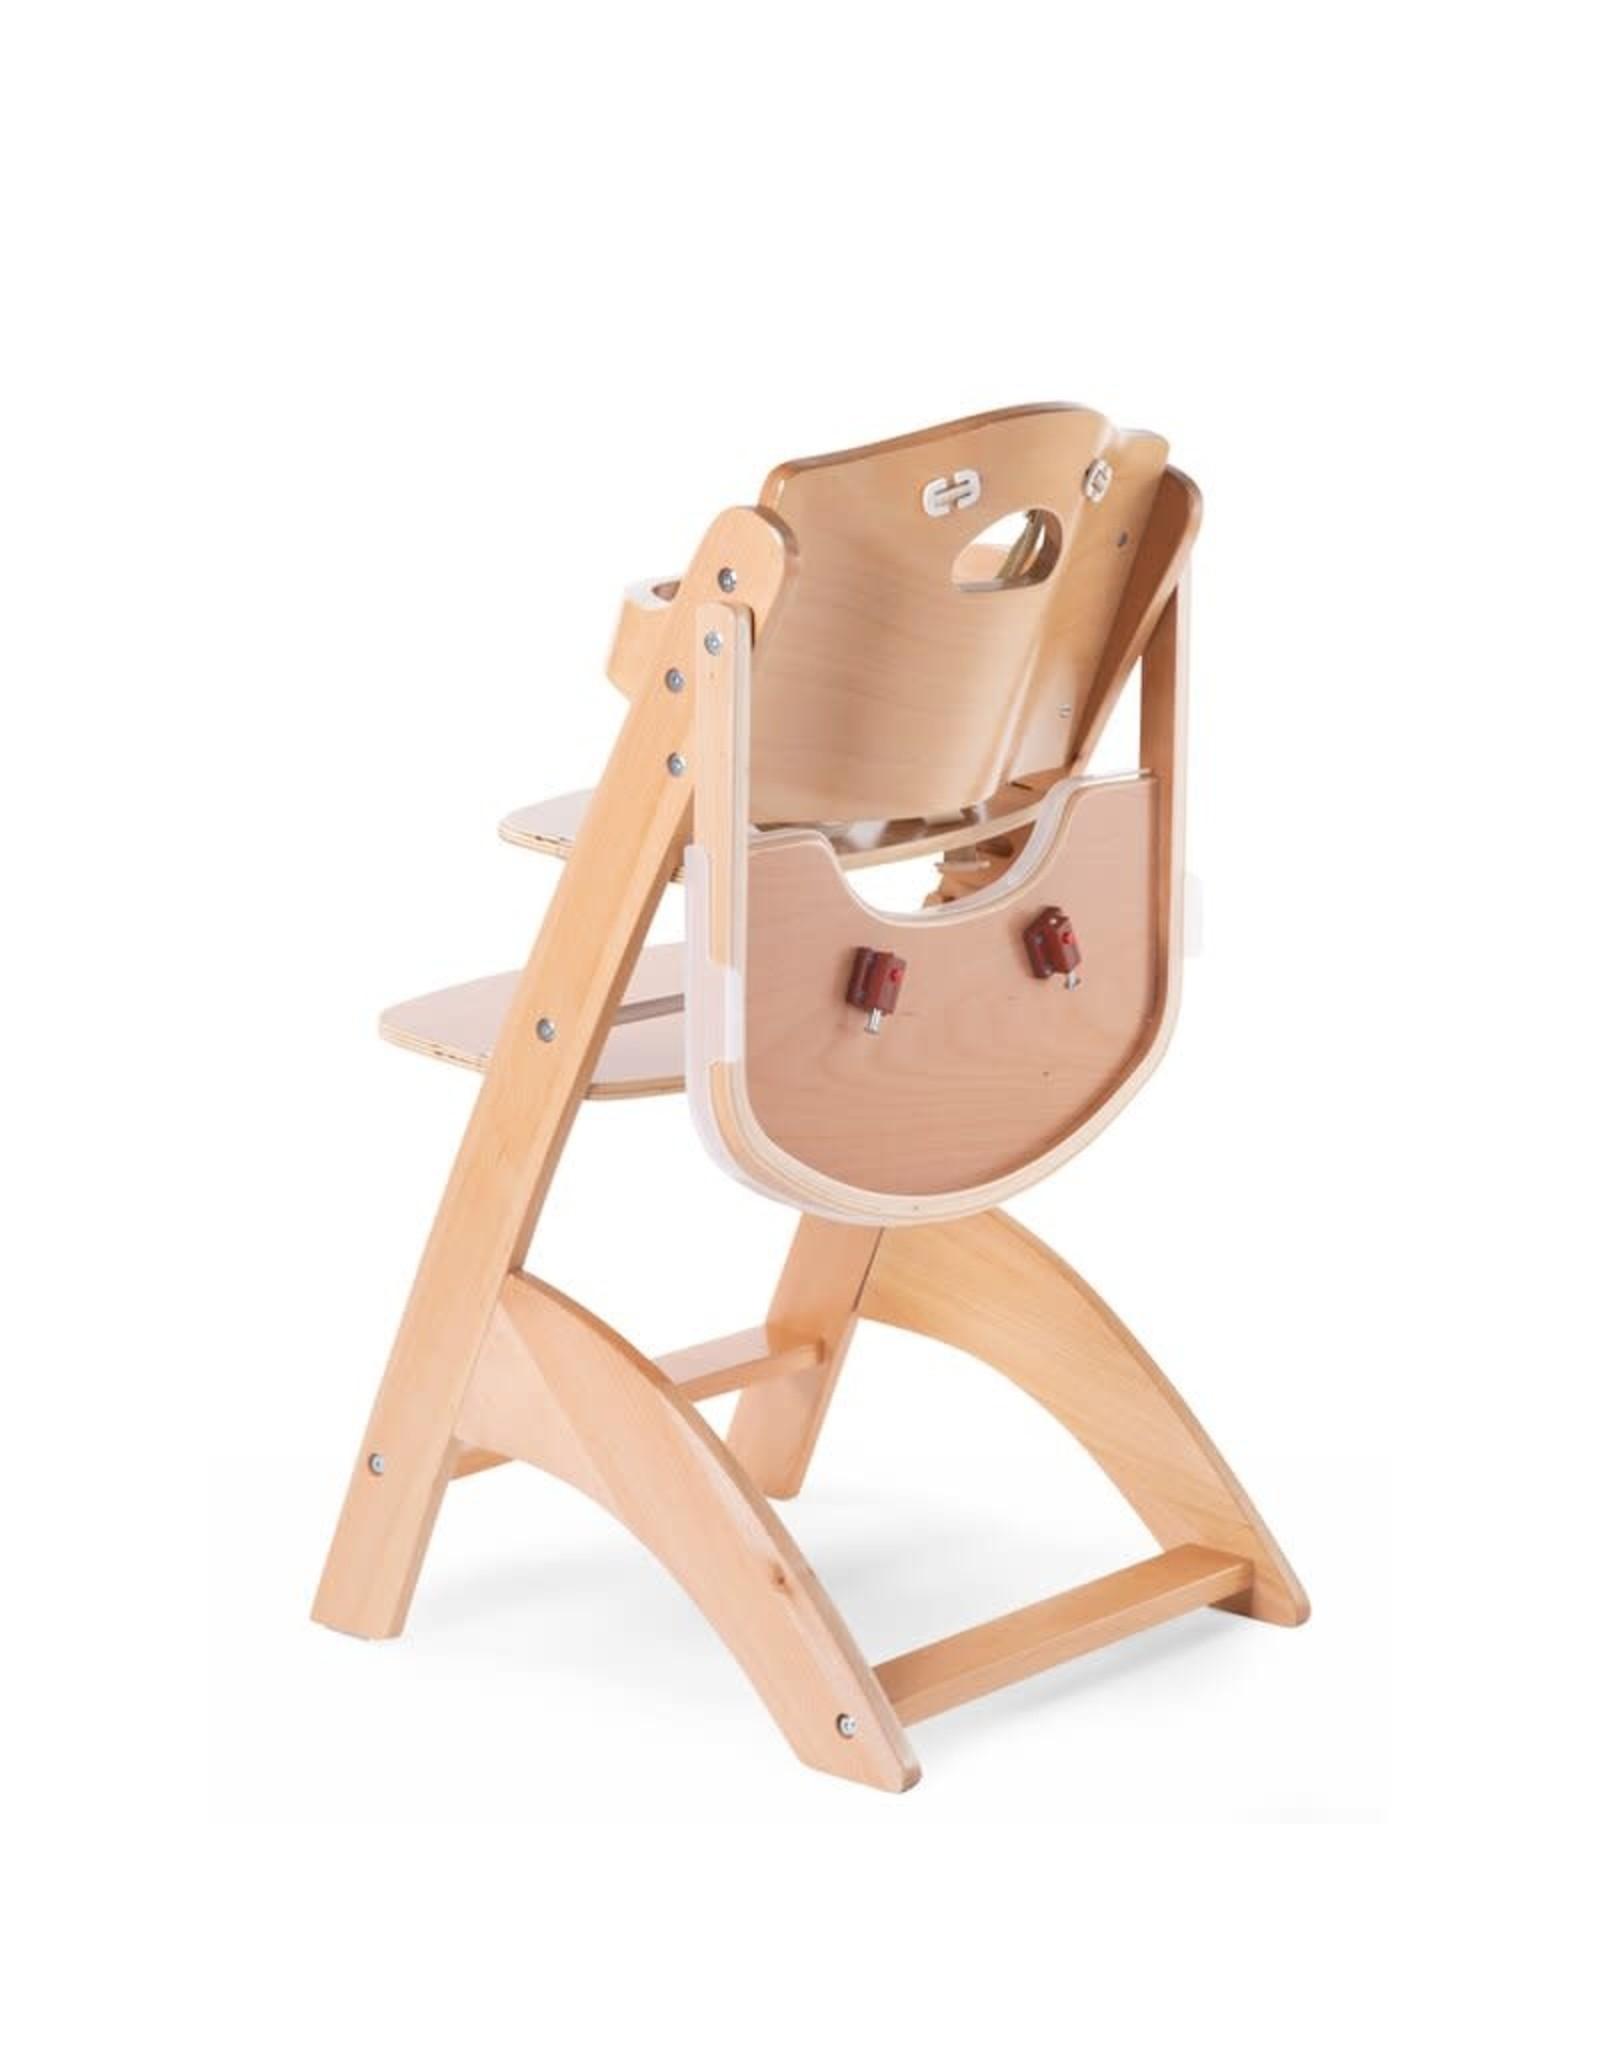 Childhome Childhome Lambda 3 Baby Kinderstoel + Eettablet - Hout - Naturel